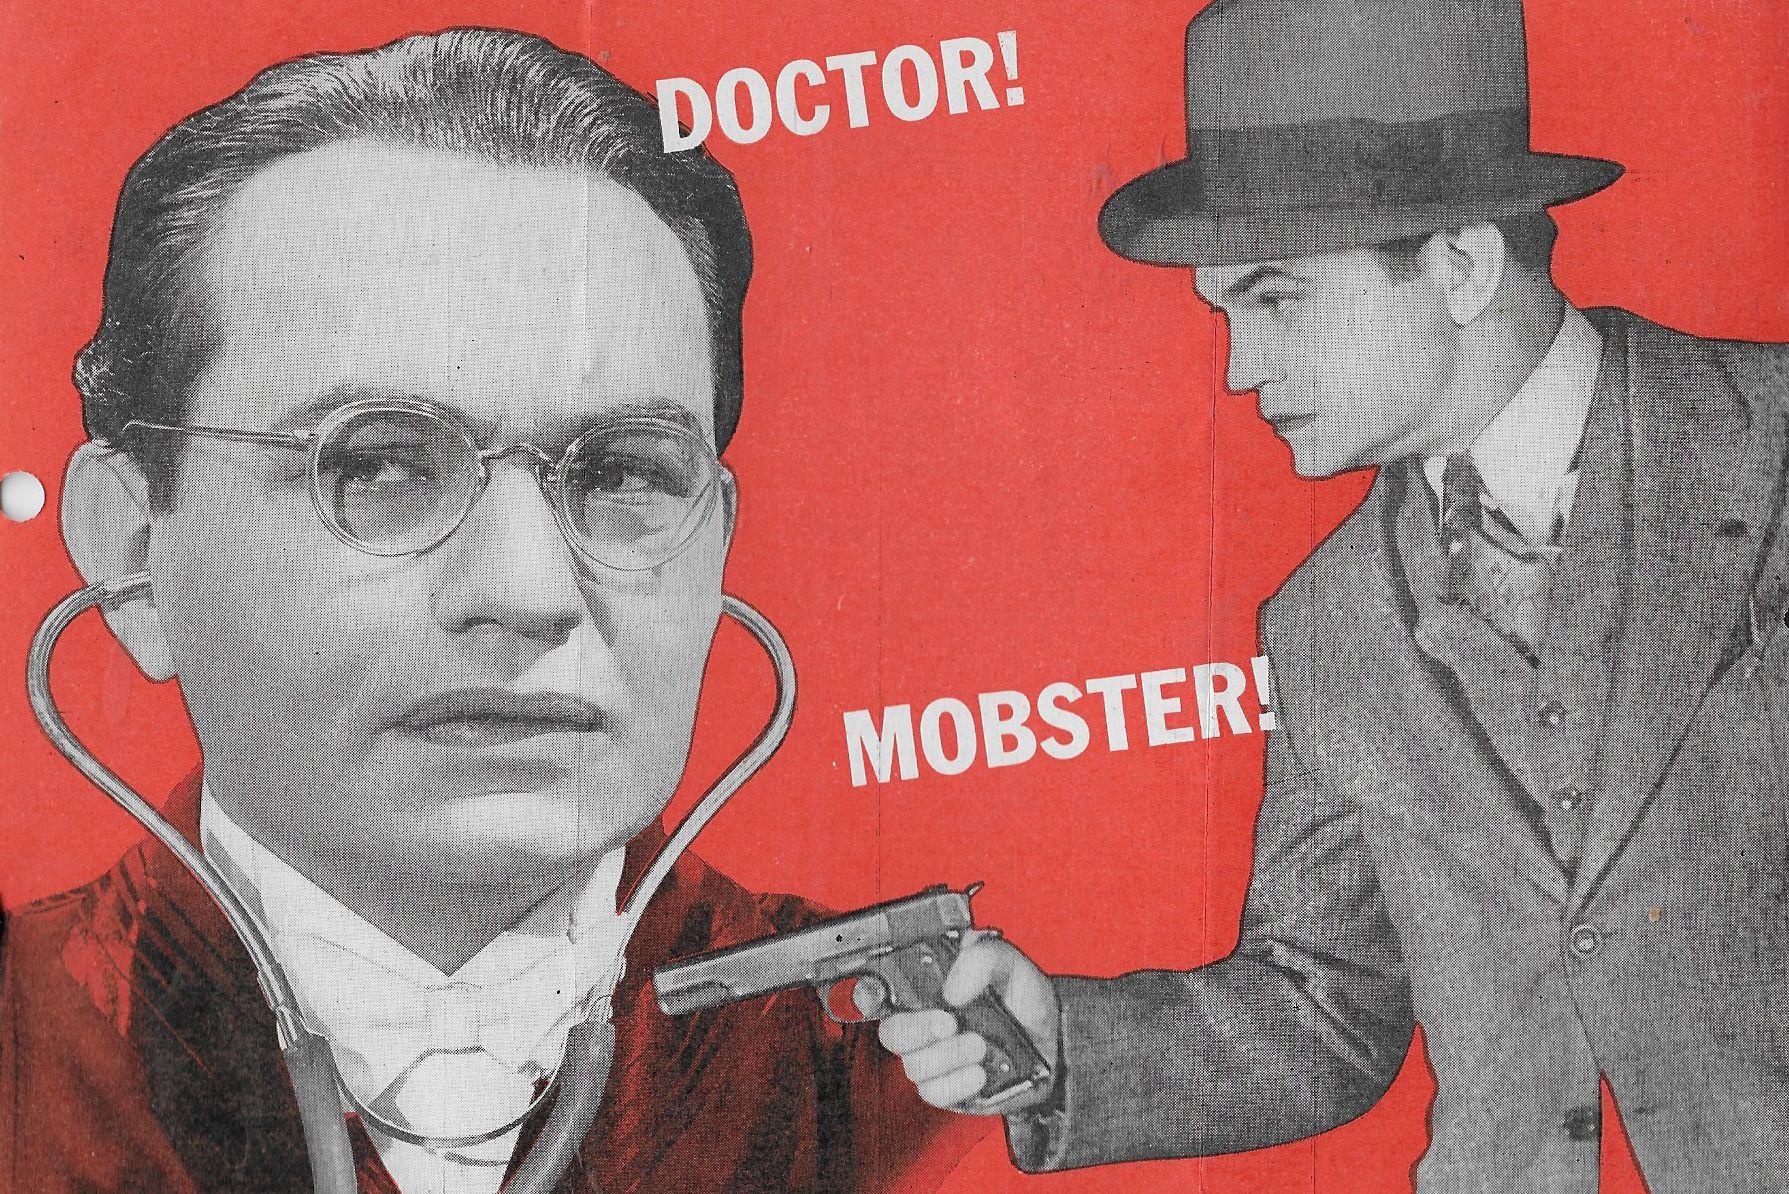 Edward G. Robinson in The Amazing Dr. Clitterhouse (1938)